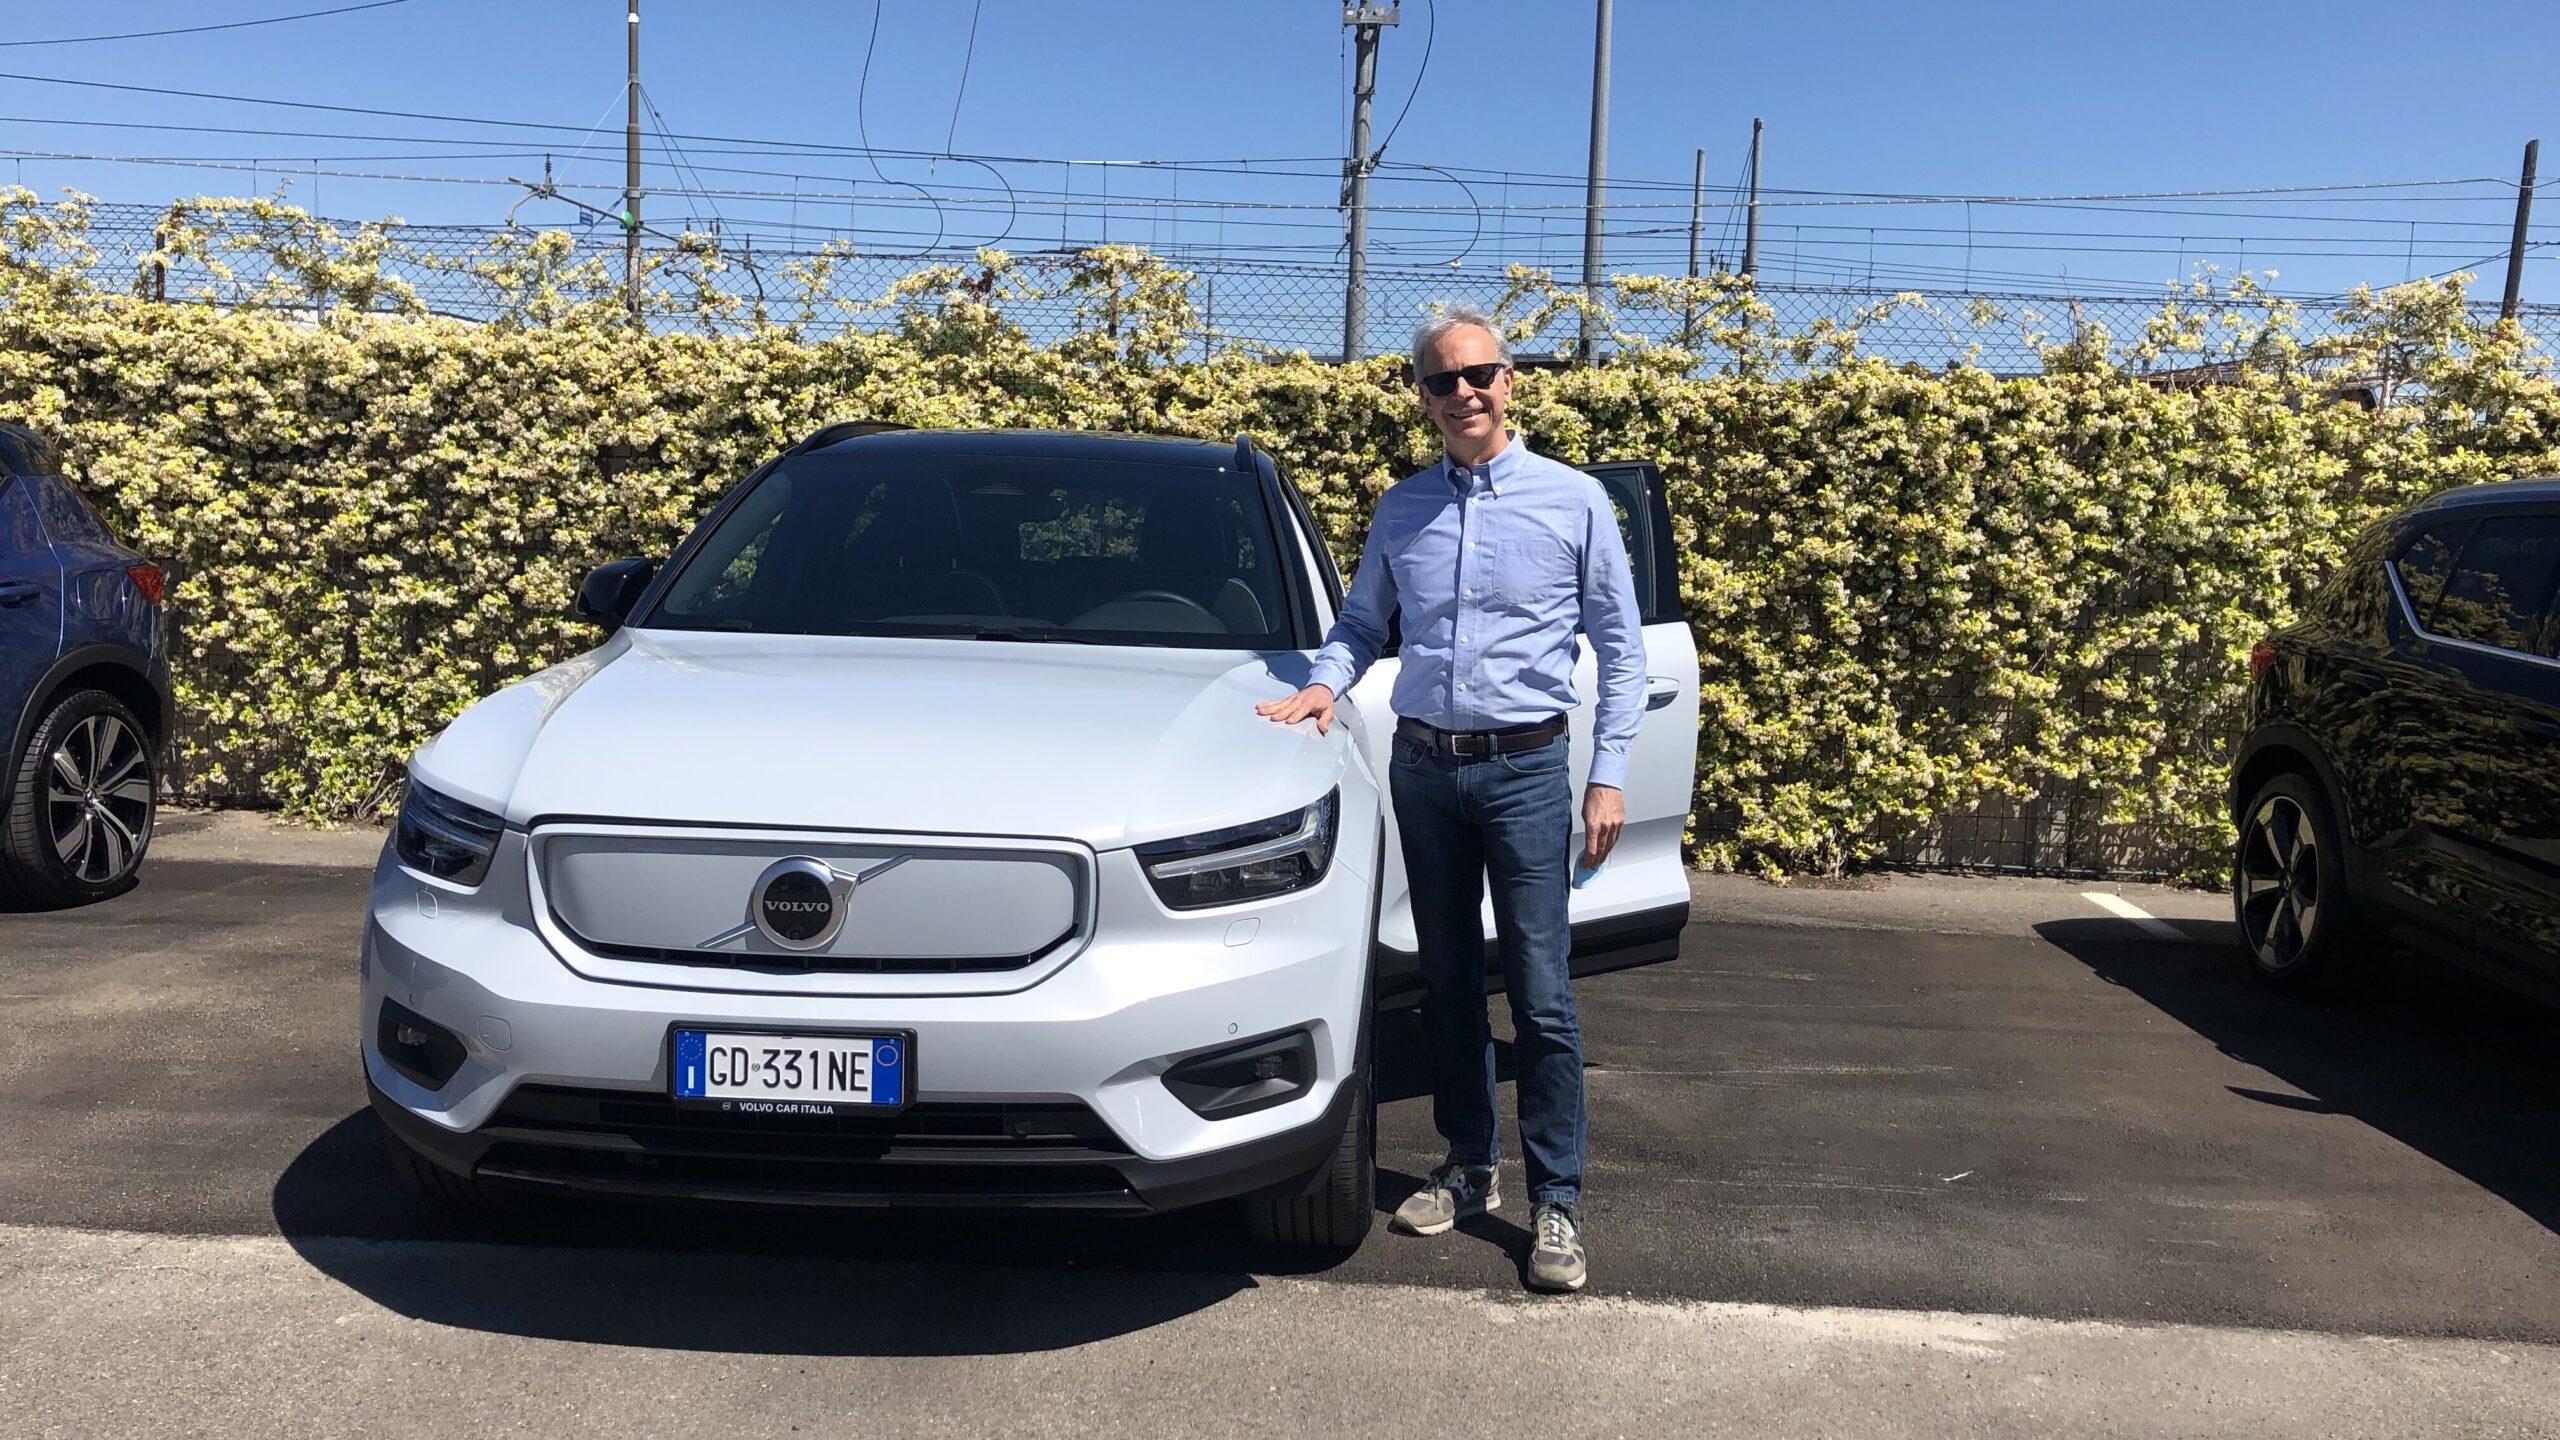 Inizio prova Volvo XC40 ev prev sede Volvo Bologna